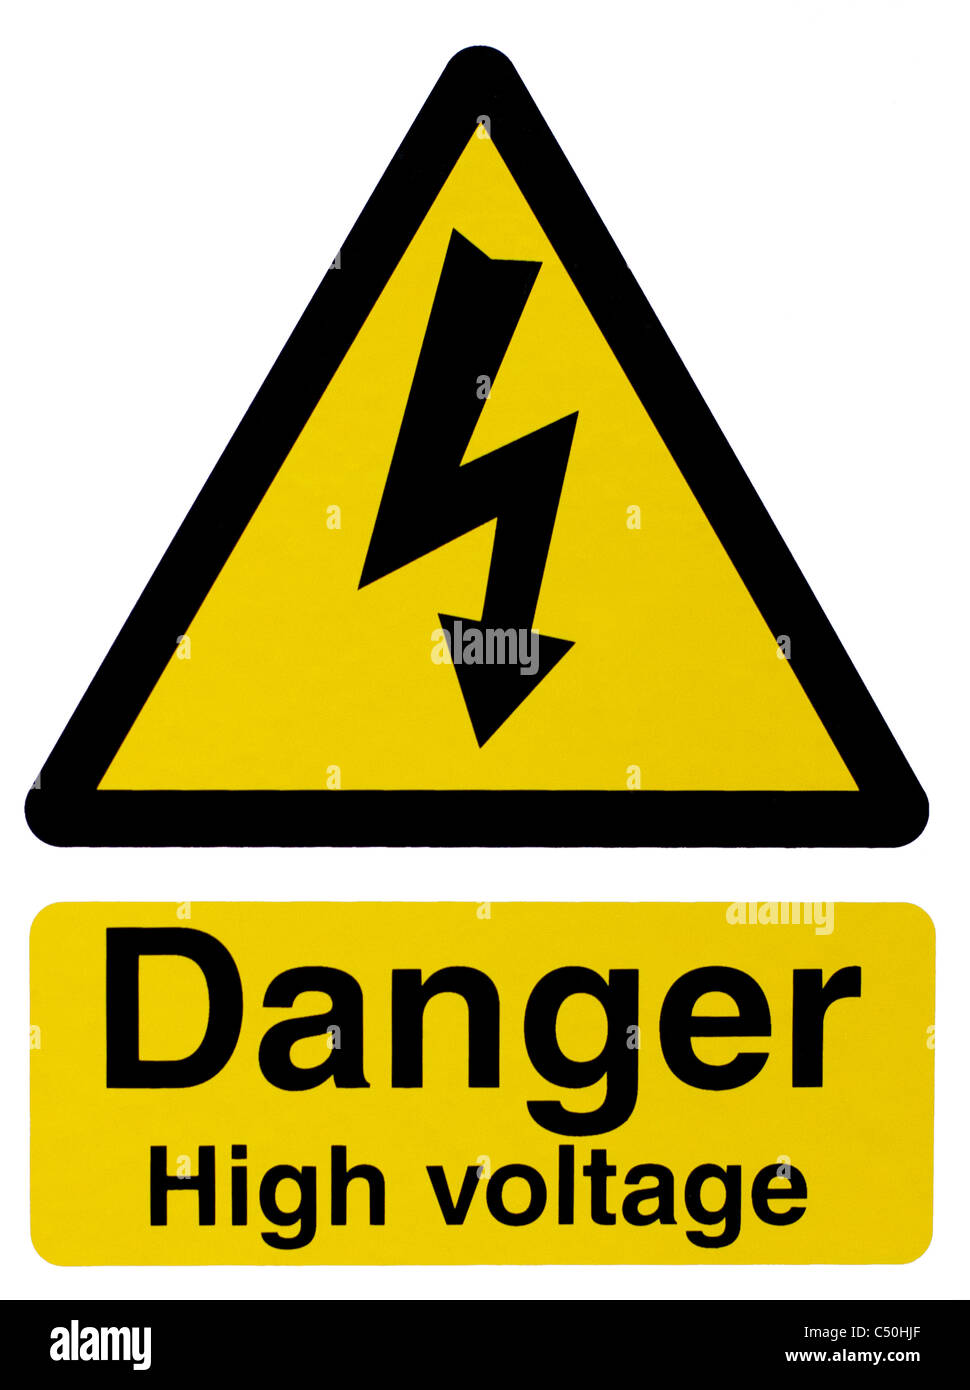 Danger High Voltage Sign with Lightning Bolt Stock Photo   Alamy